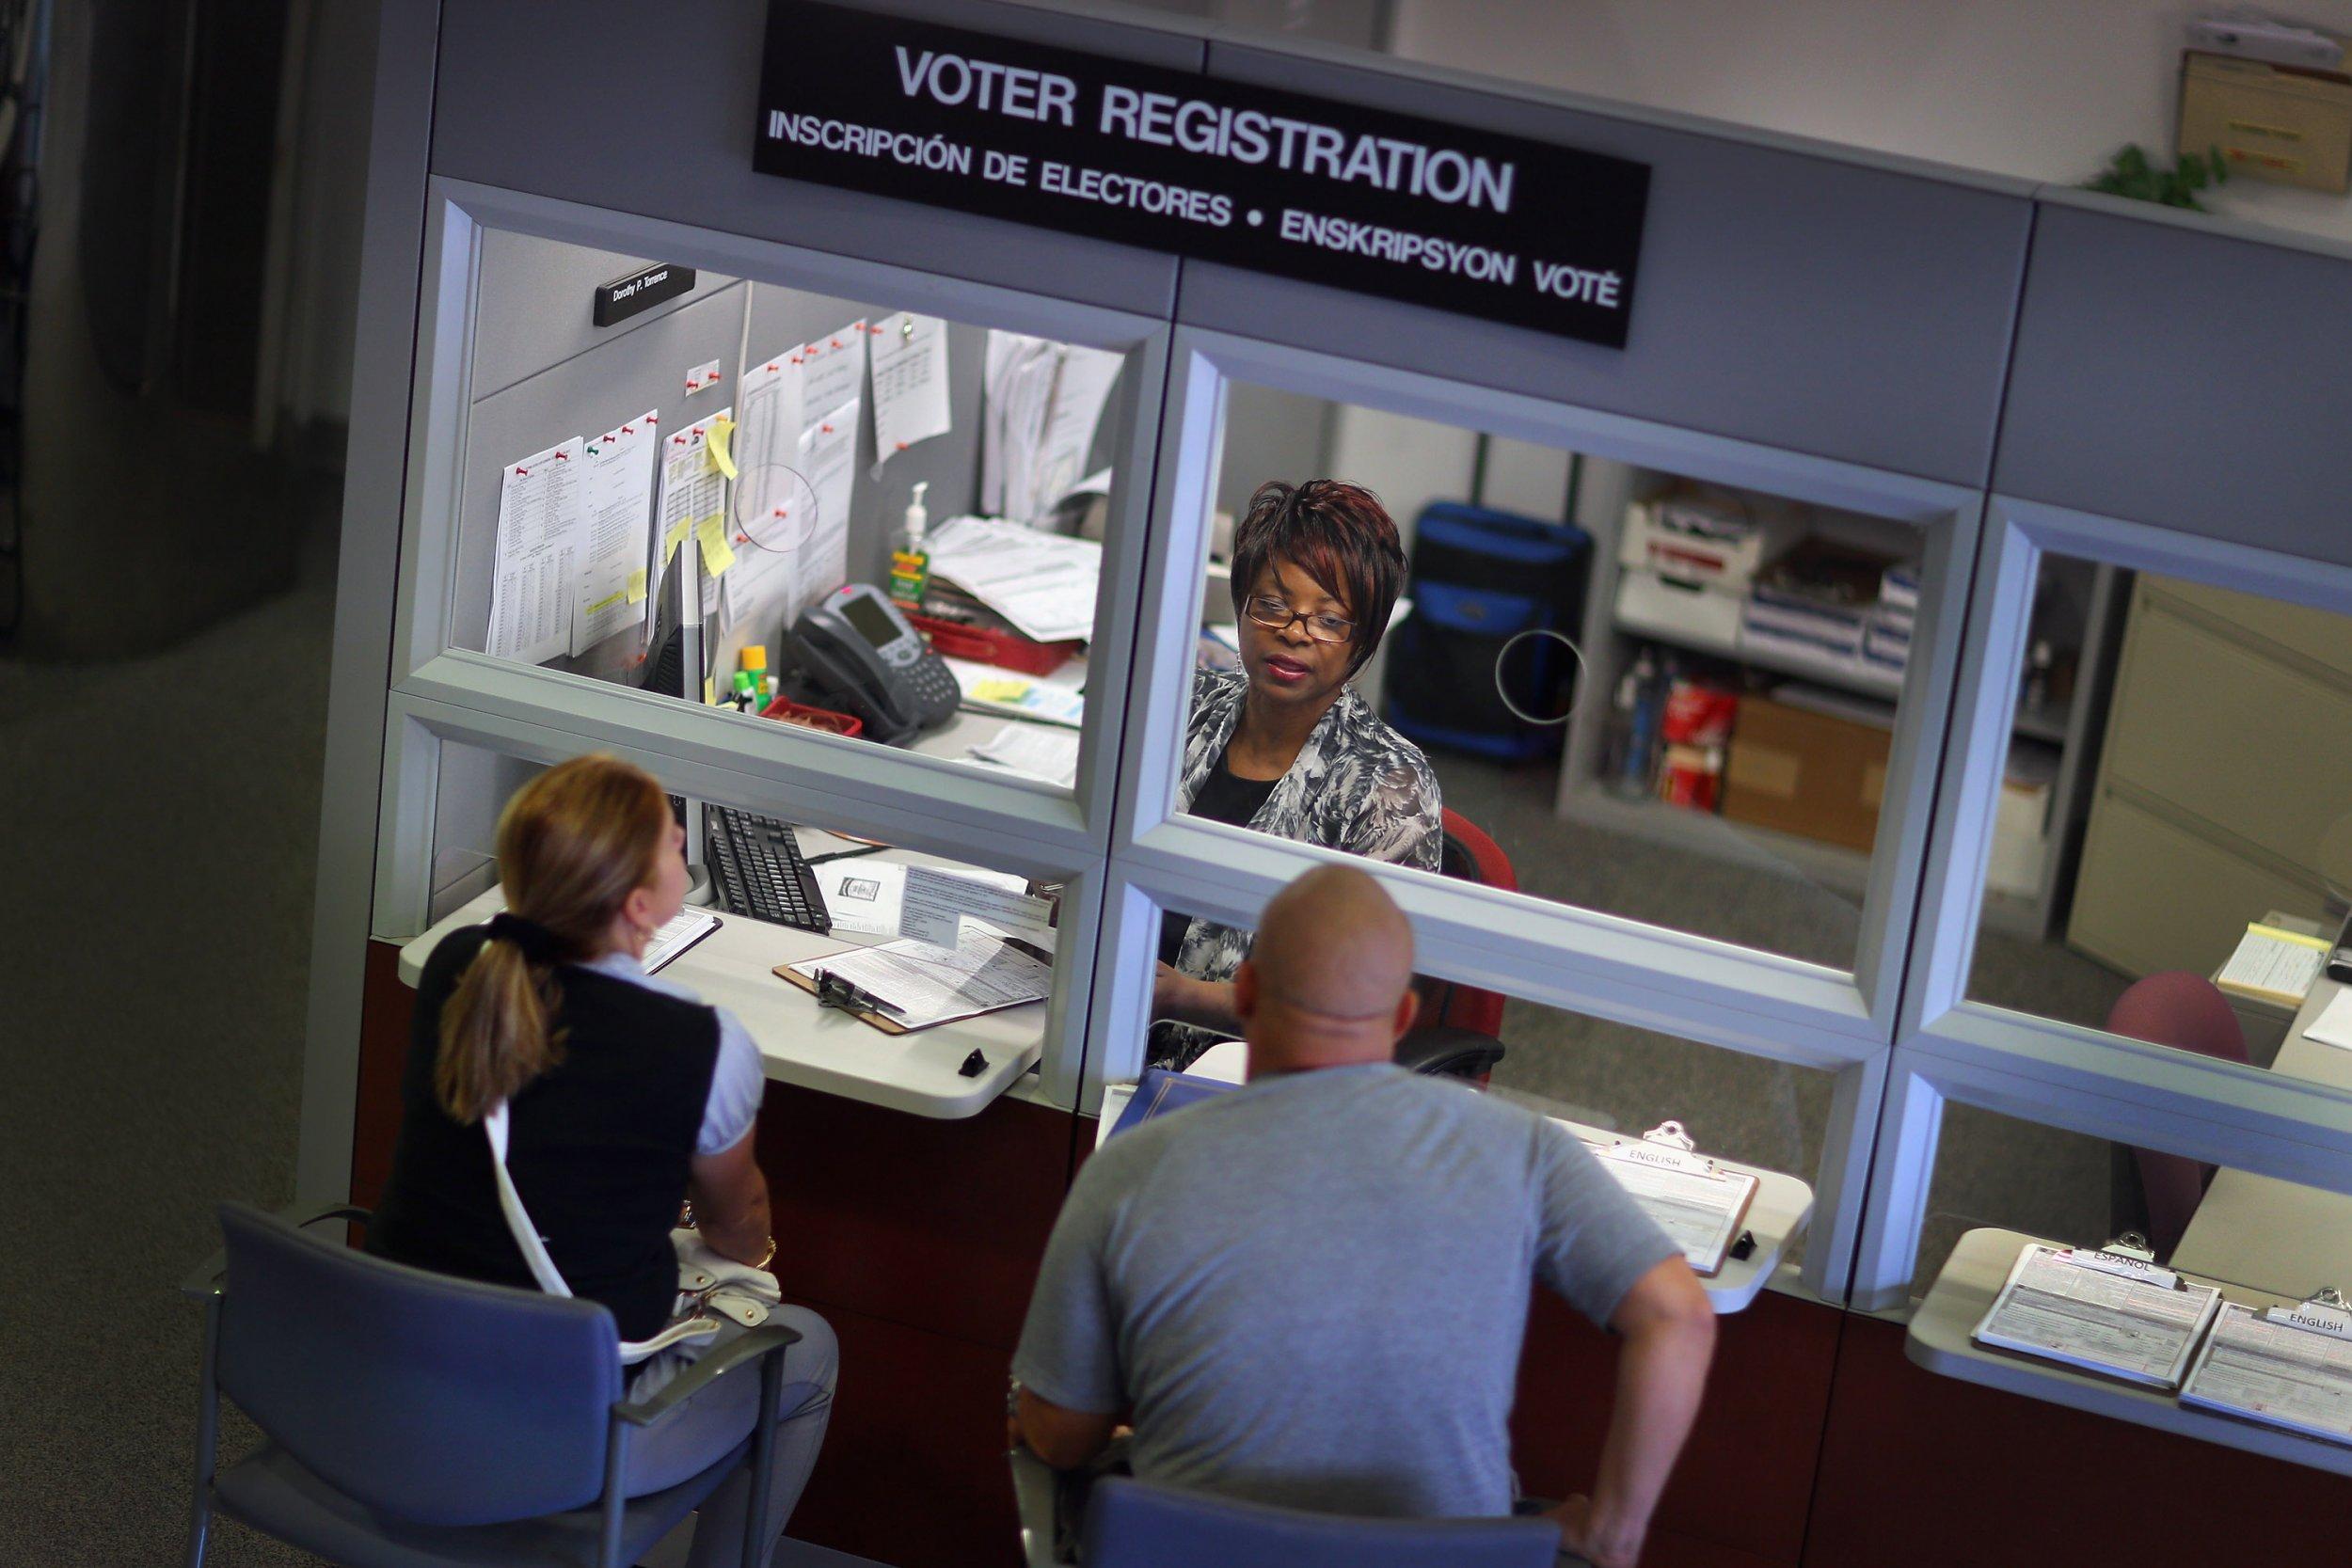 04_06_18_VoterRegistration